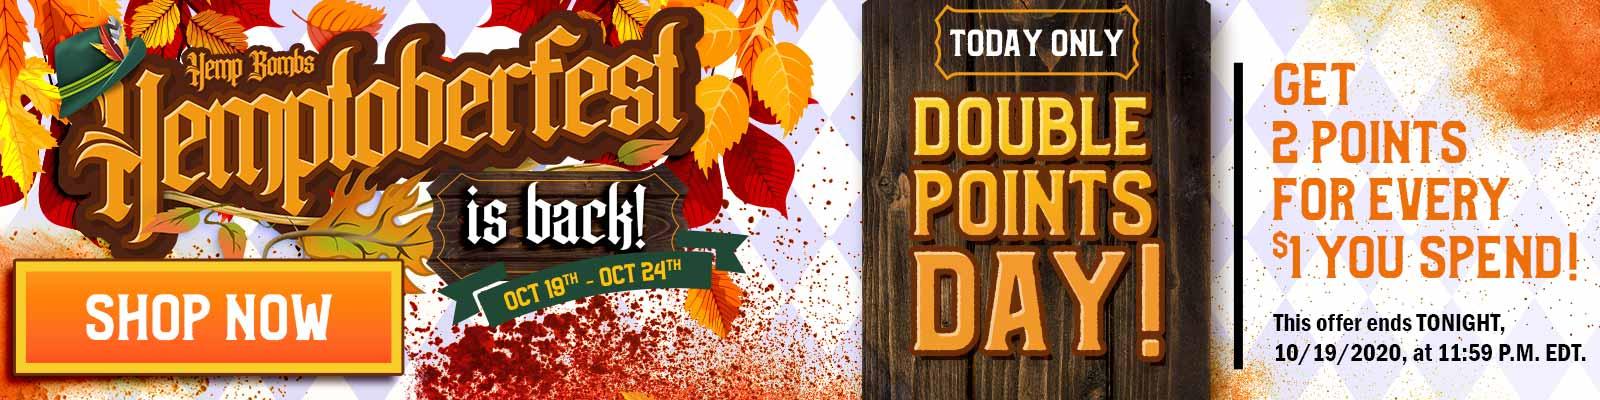 Hemptoberfest CBD Hemp Festival - Day 1 Offer